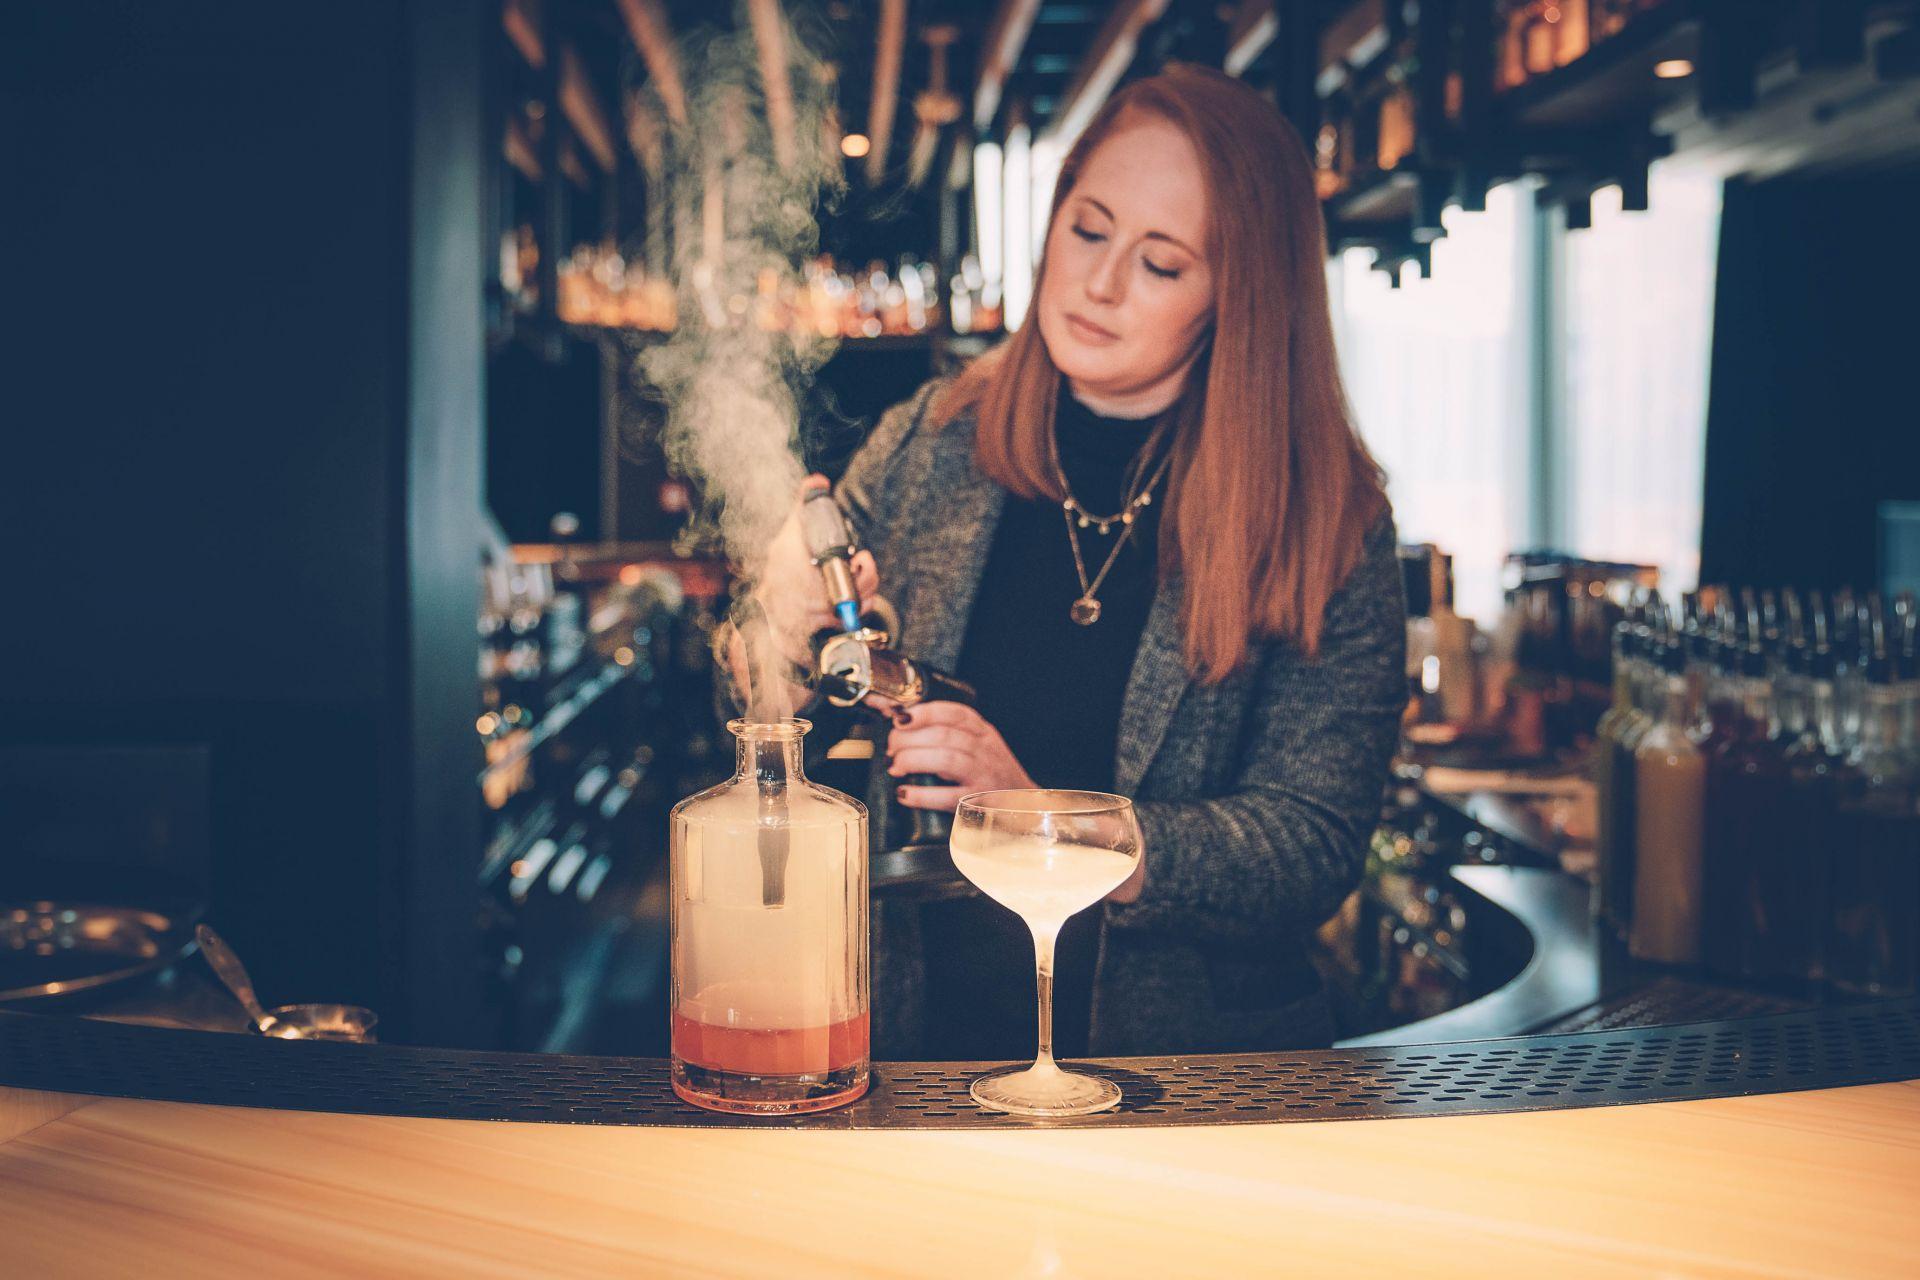 Barkeeperin oder Zauberin? – ©wunderland media GmbH